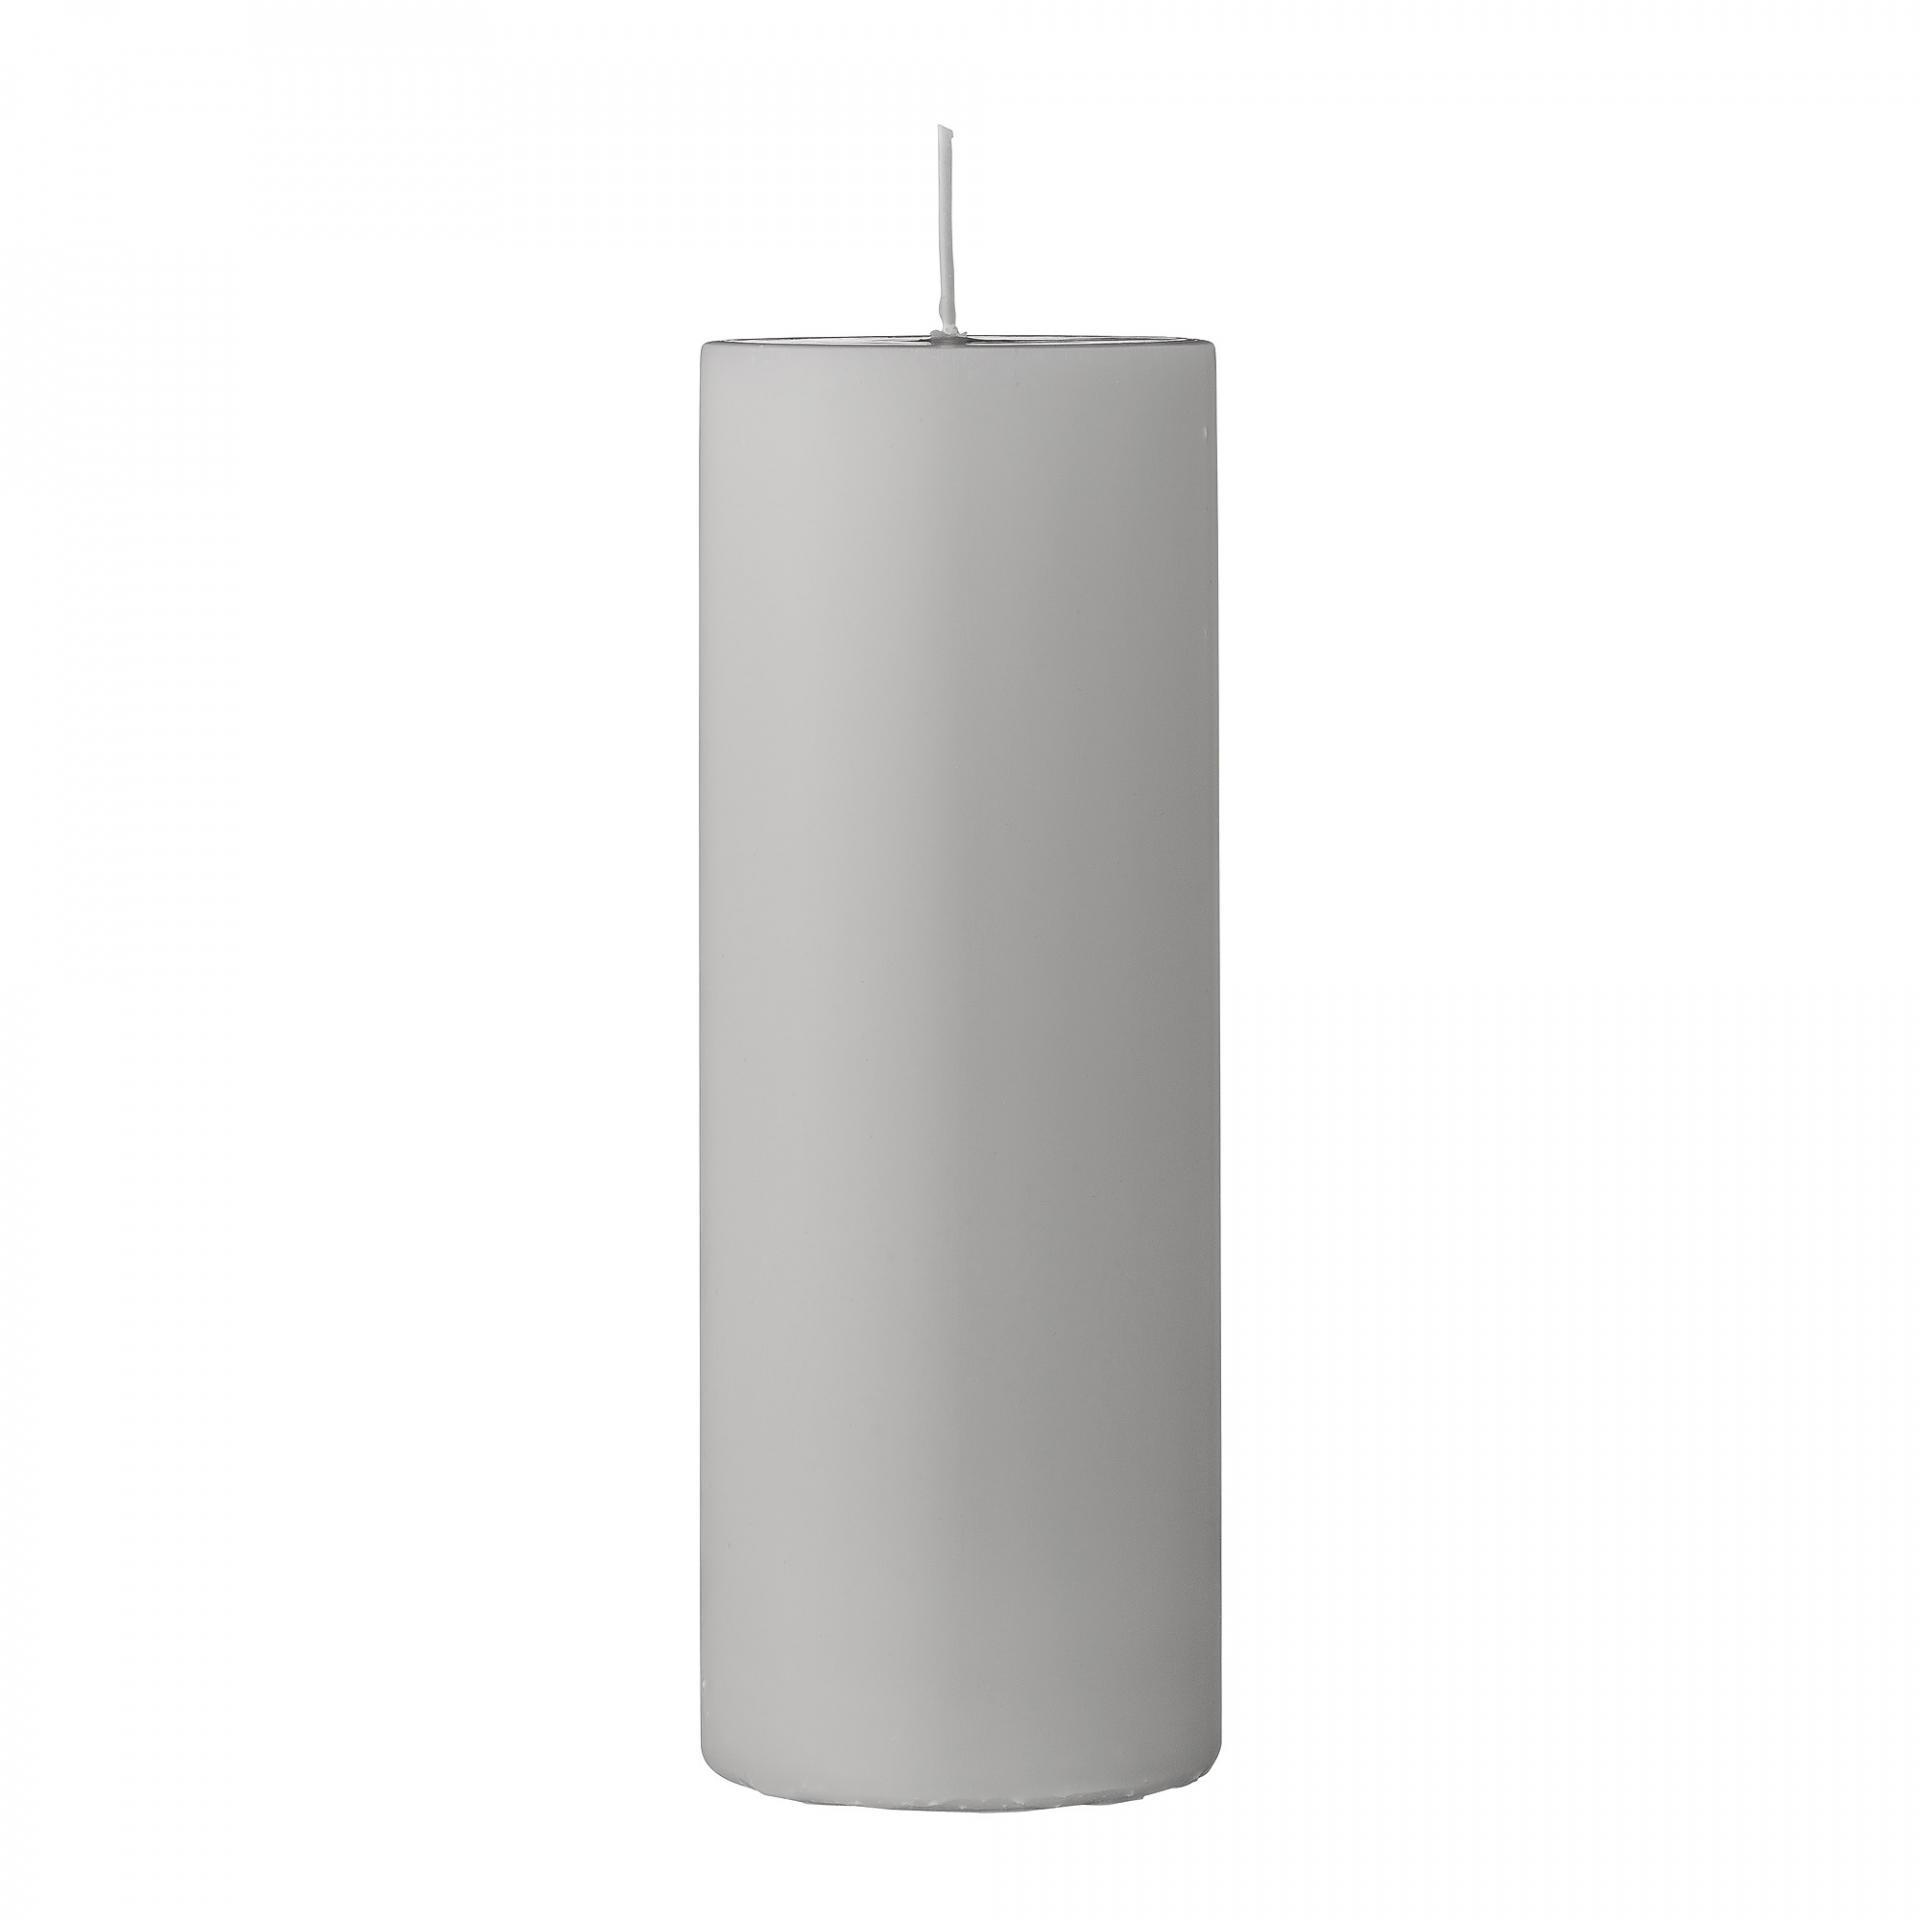 Bloomingville Svíčka Light Grey 20 cm, šedá barva